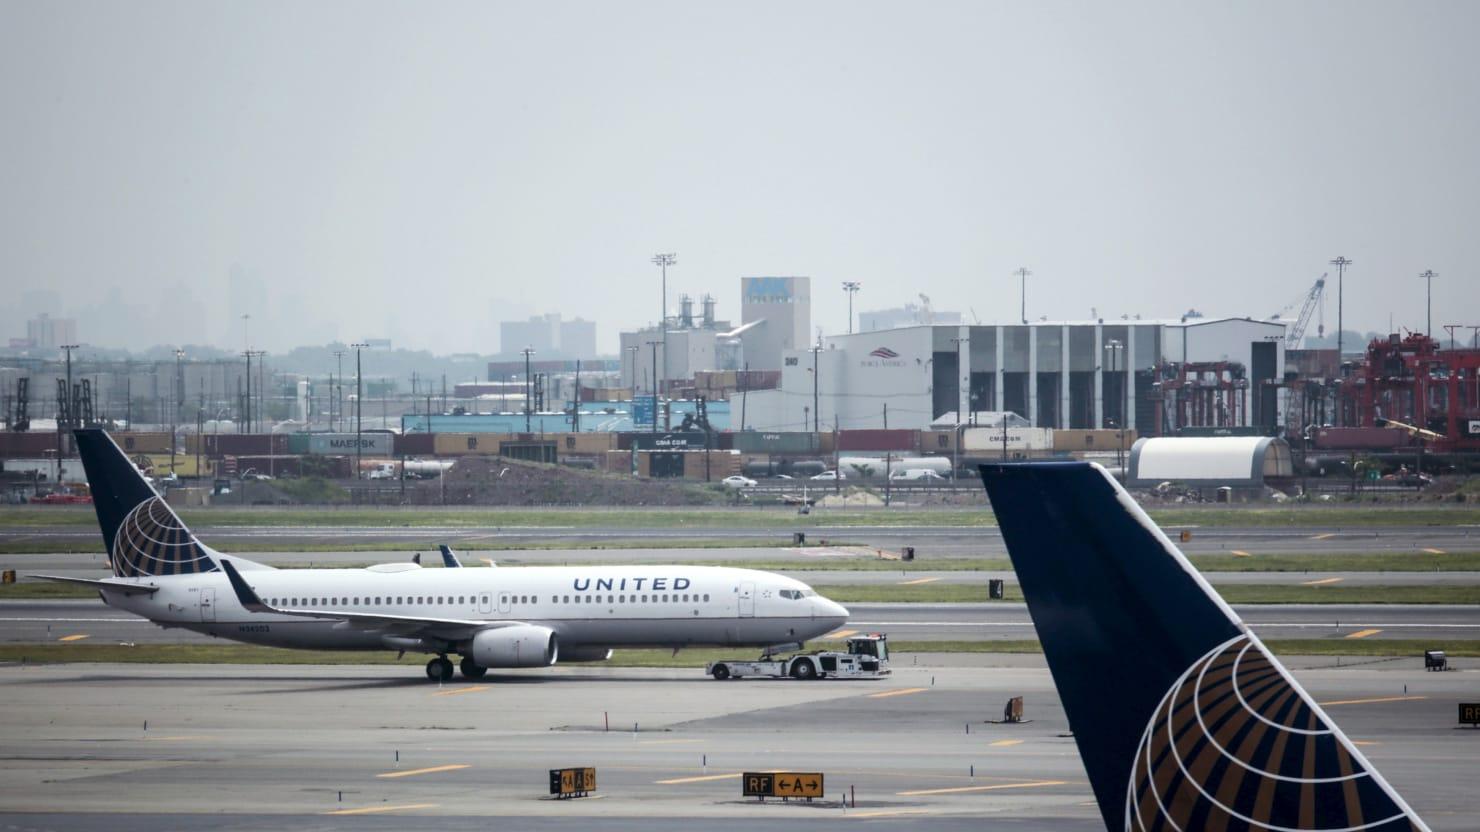 United Airlines Plane Skids Off Runway in Newark Disrupting Air Travel